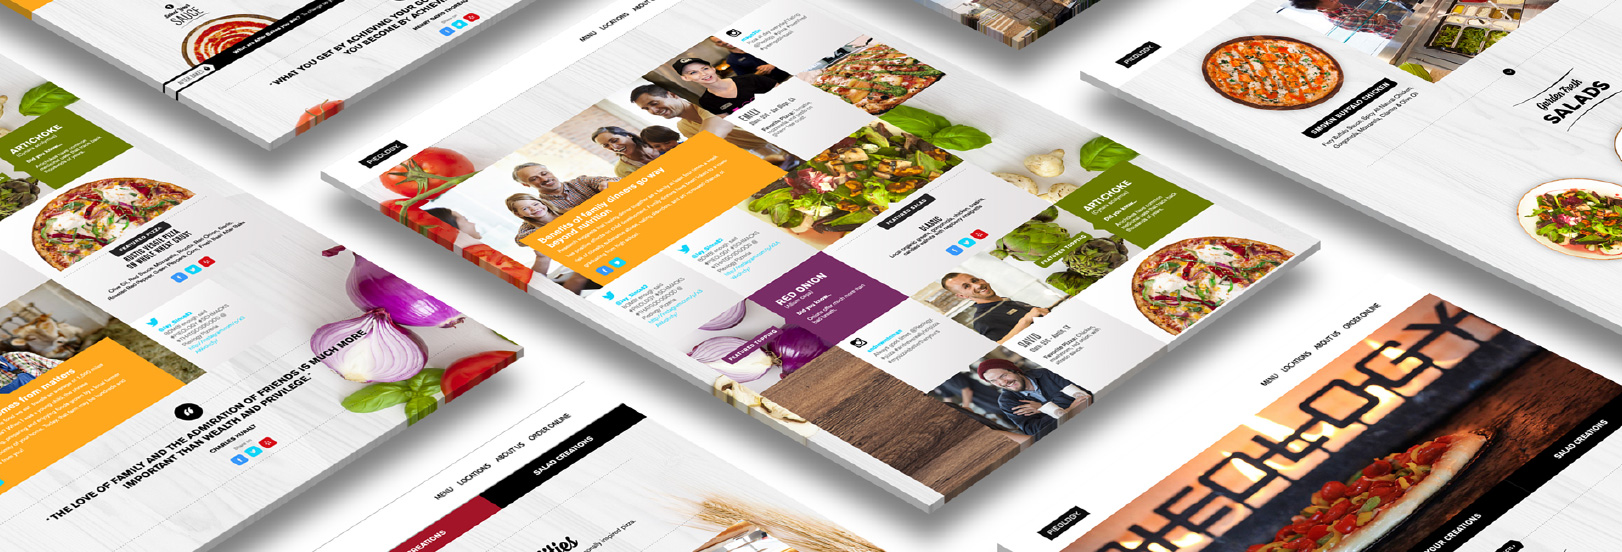 restaurant branding and website design